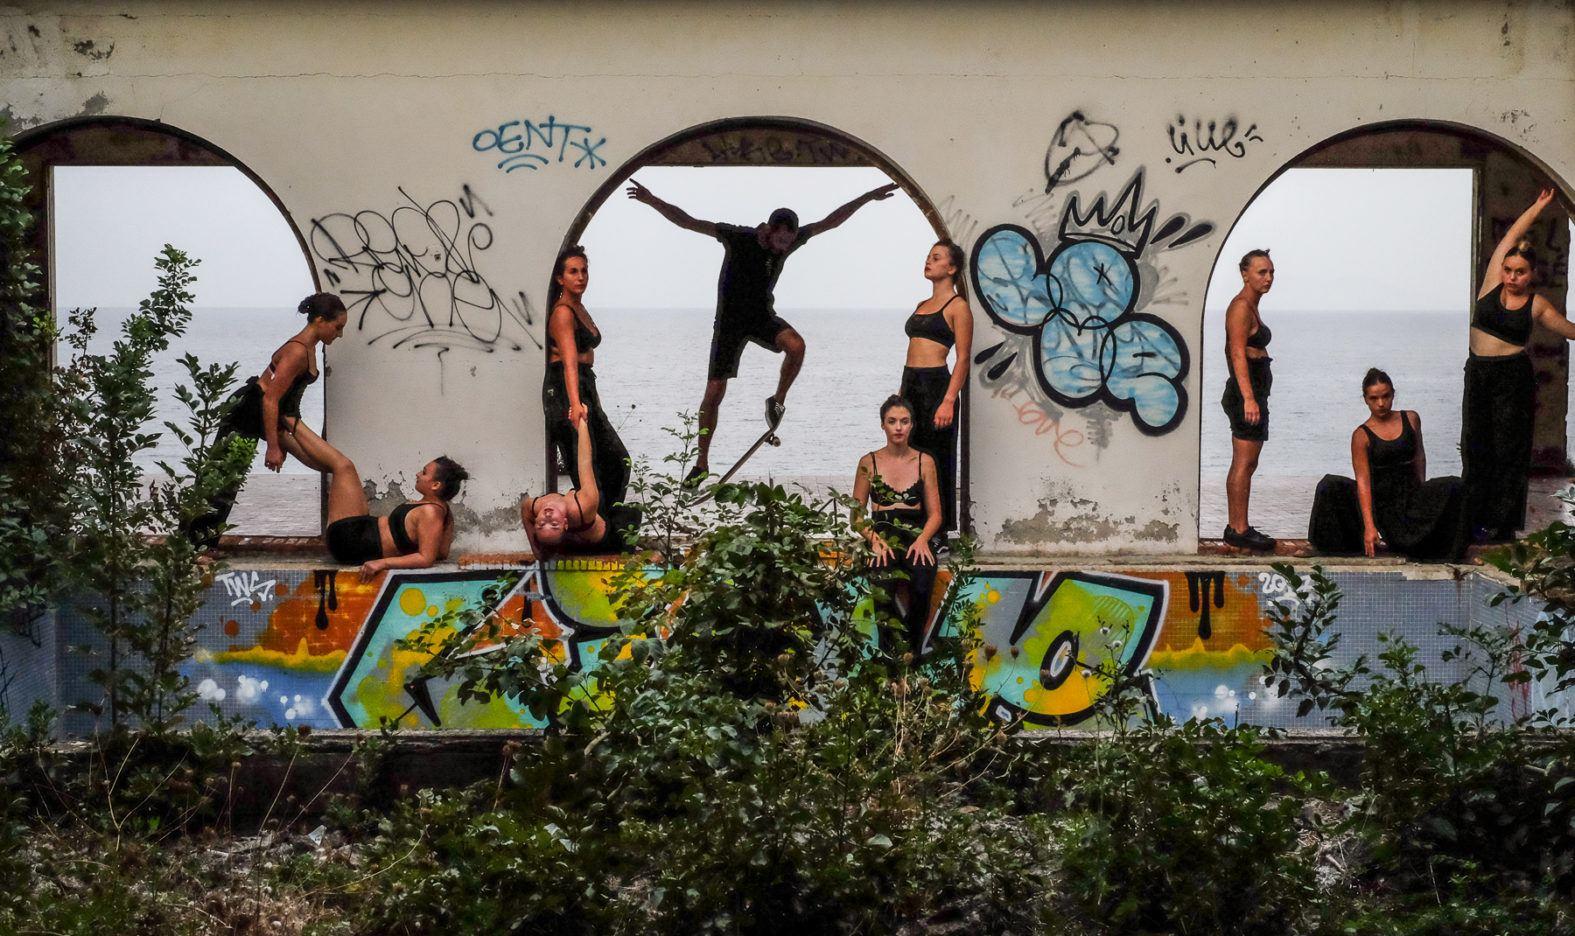 t-shirt noir intense -Skate - UNITE - Graffiti